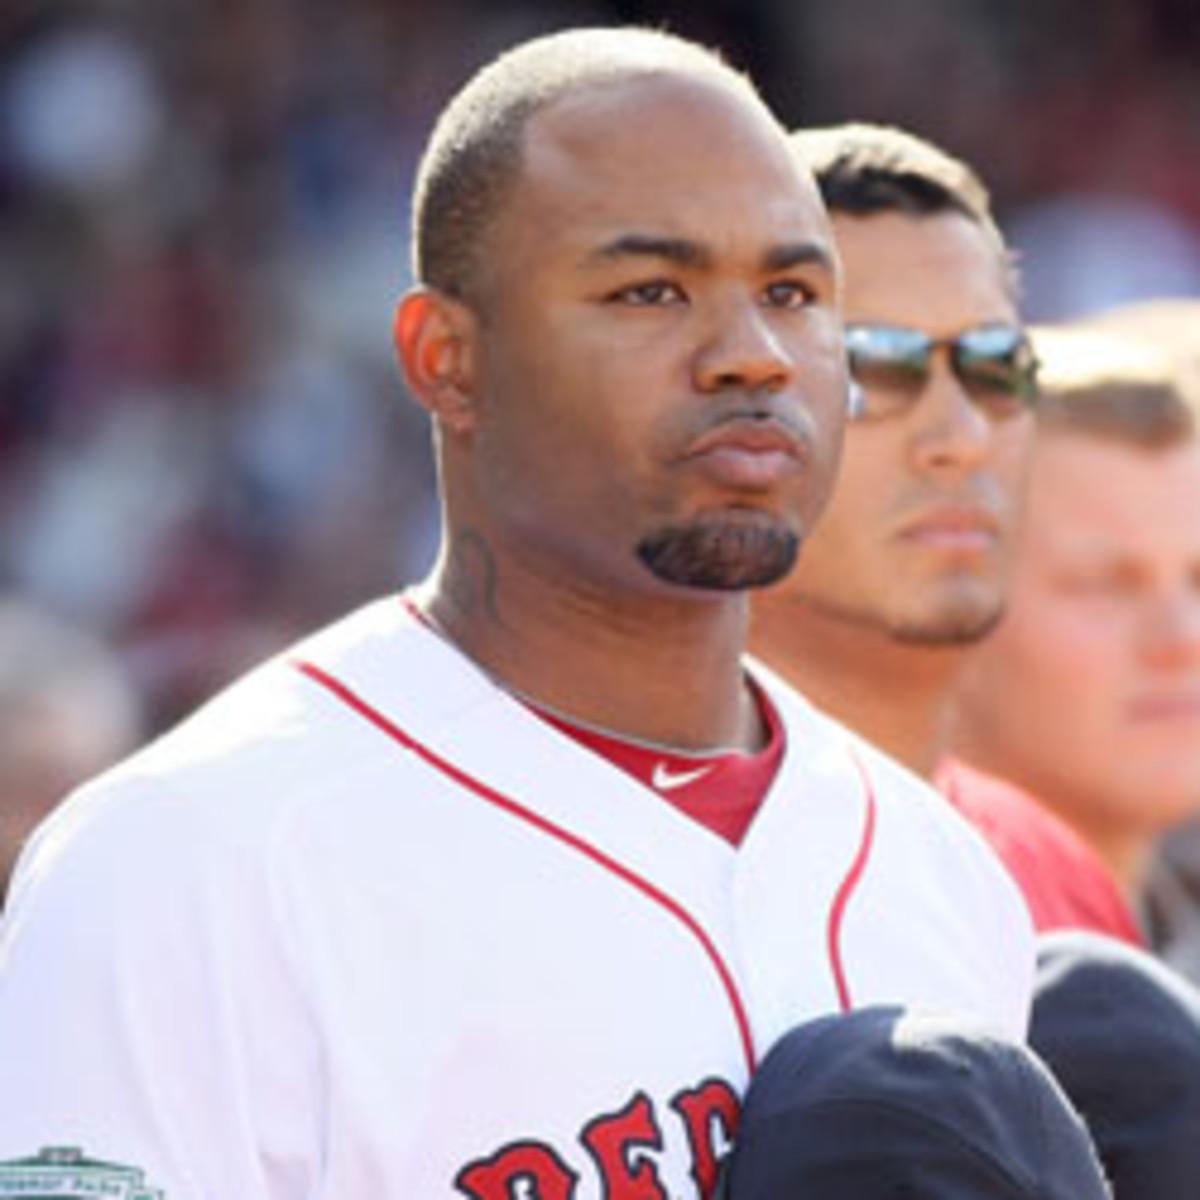 Carl Crawford, Boston Red Sox